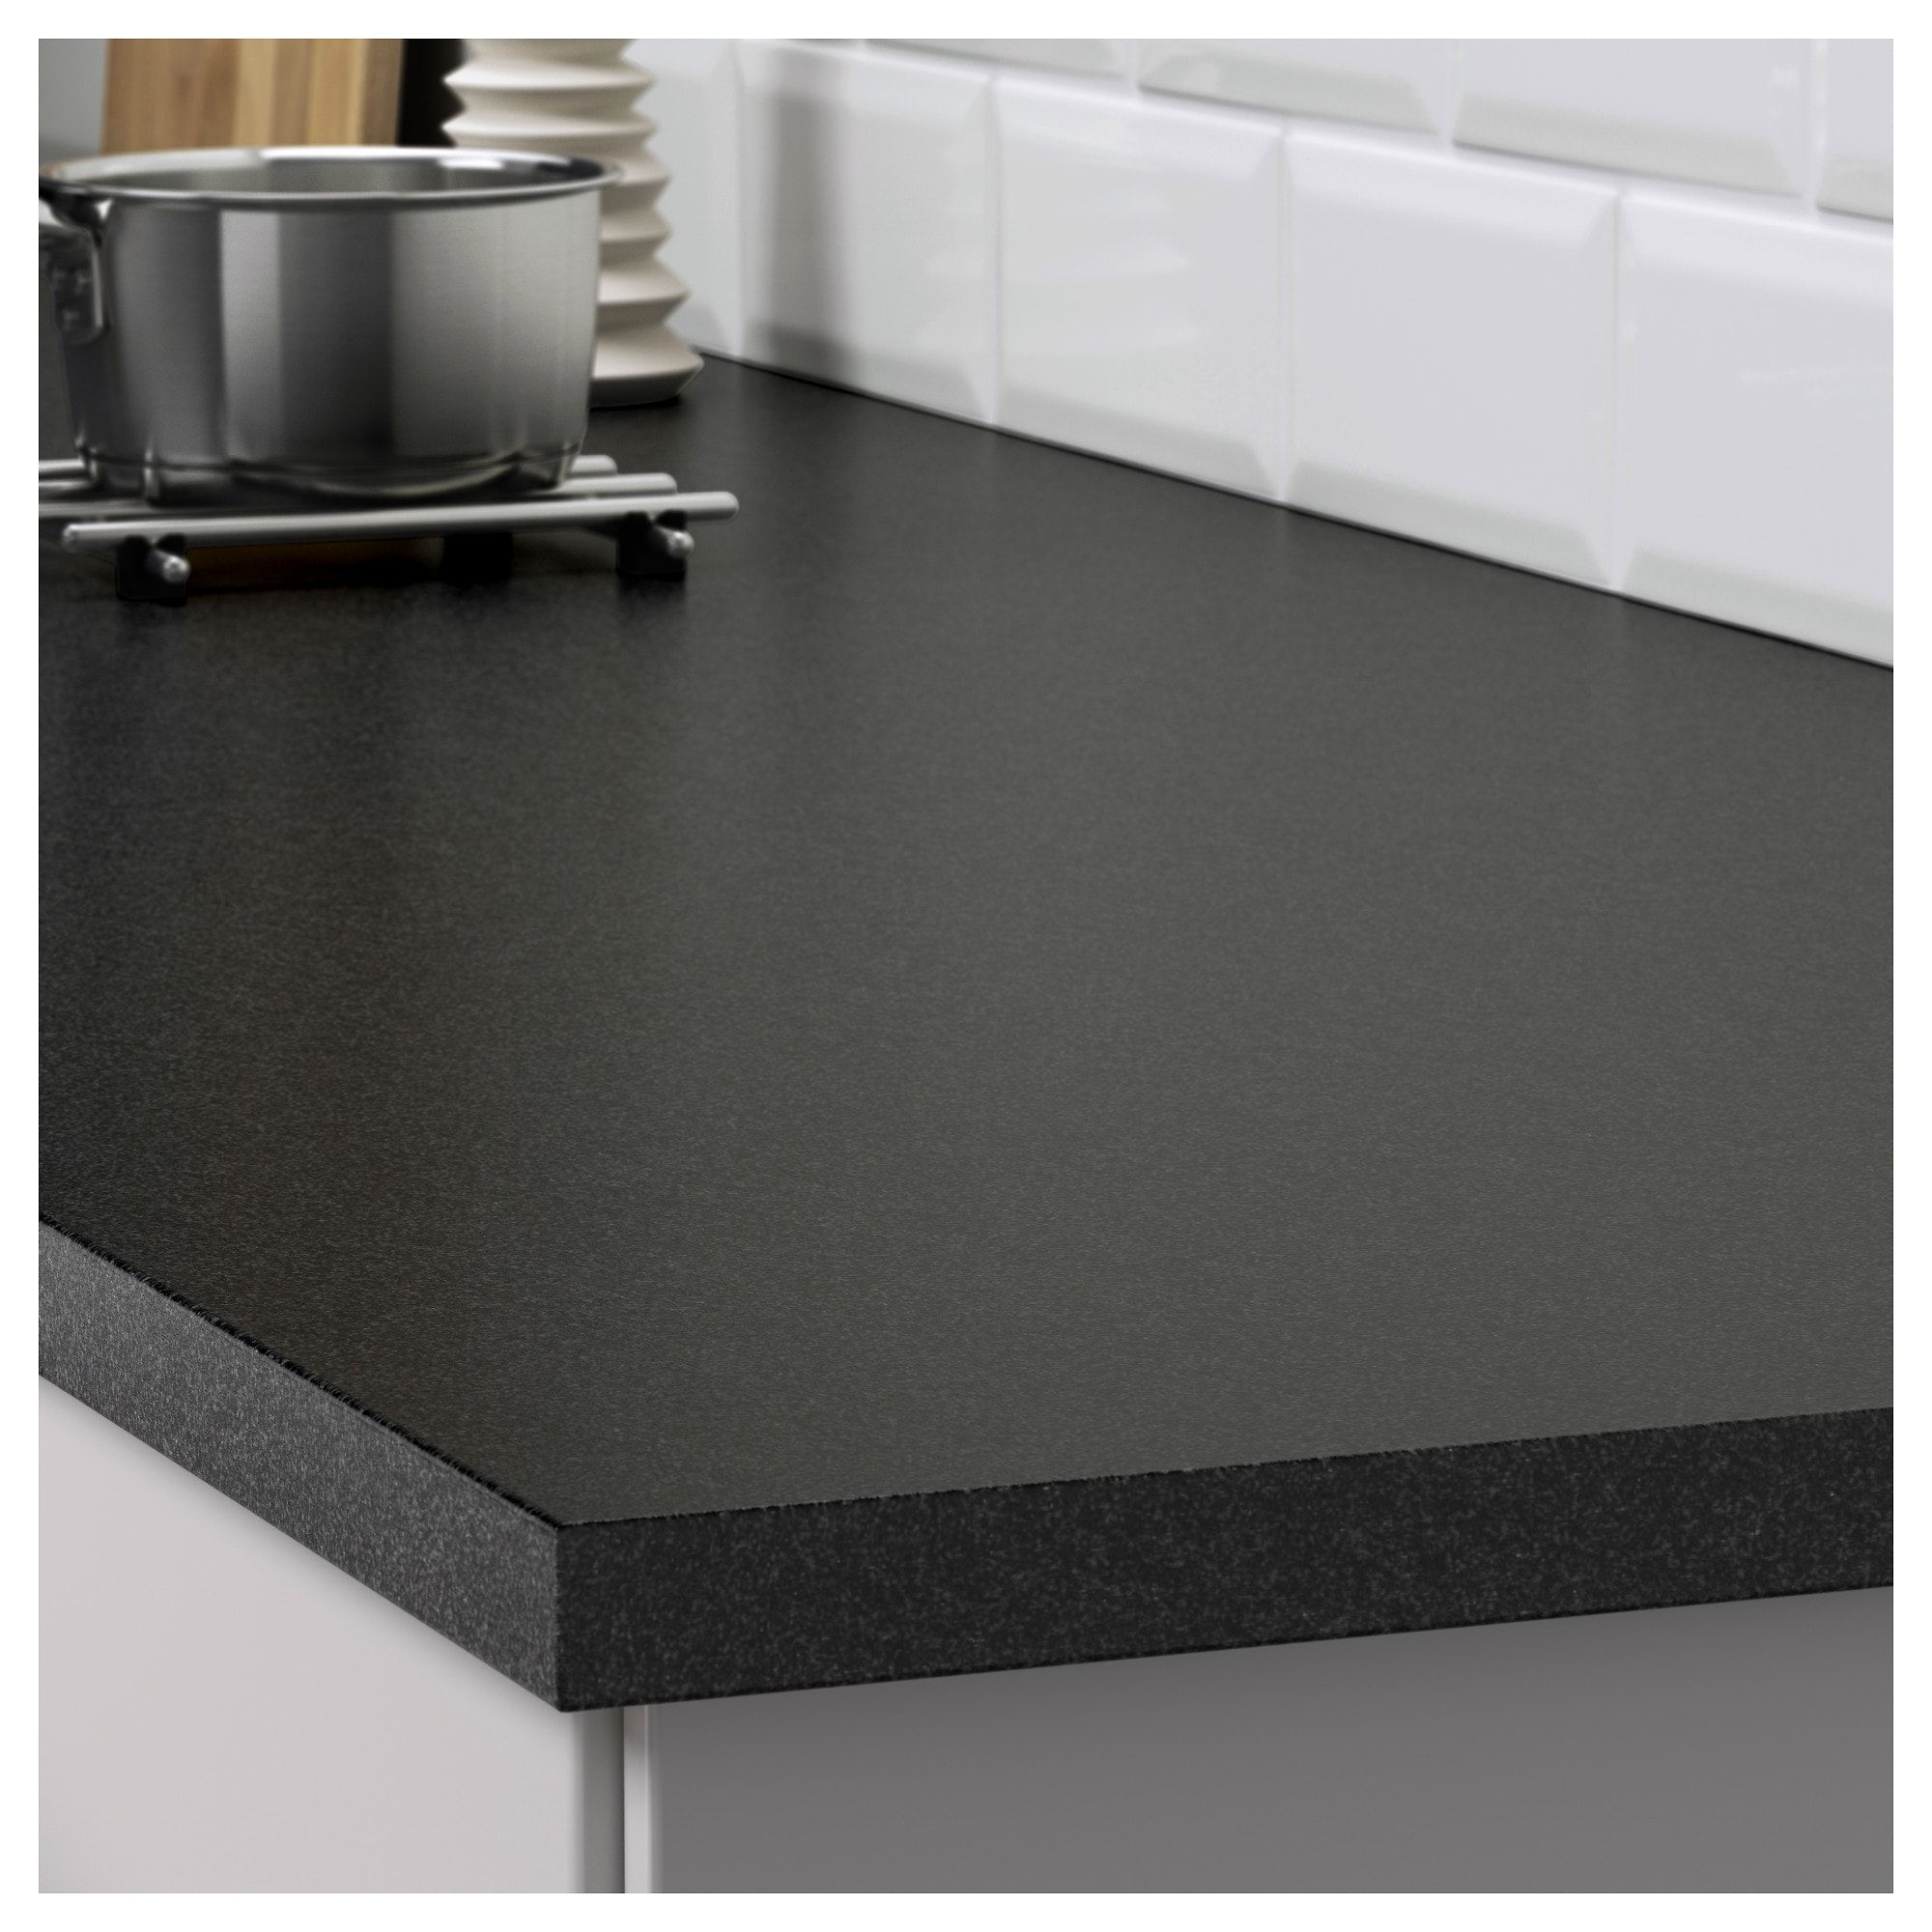 Ekbacken Countertop Black Stone Effect Laminate 98x1 1 8 Ikea Kitchen Remodel Countertops Countertops Laminate Countertops